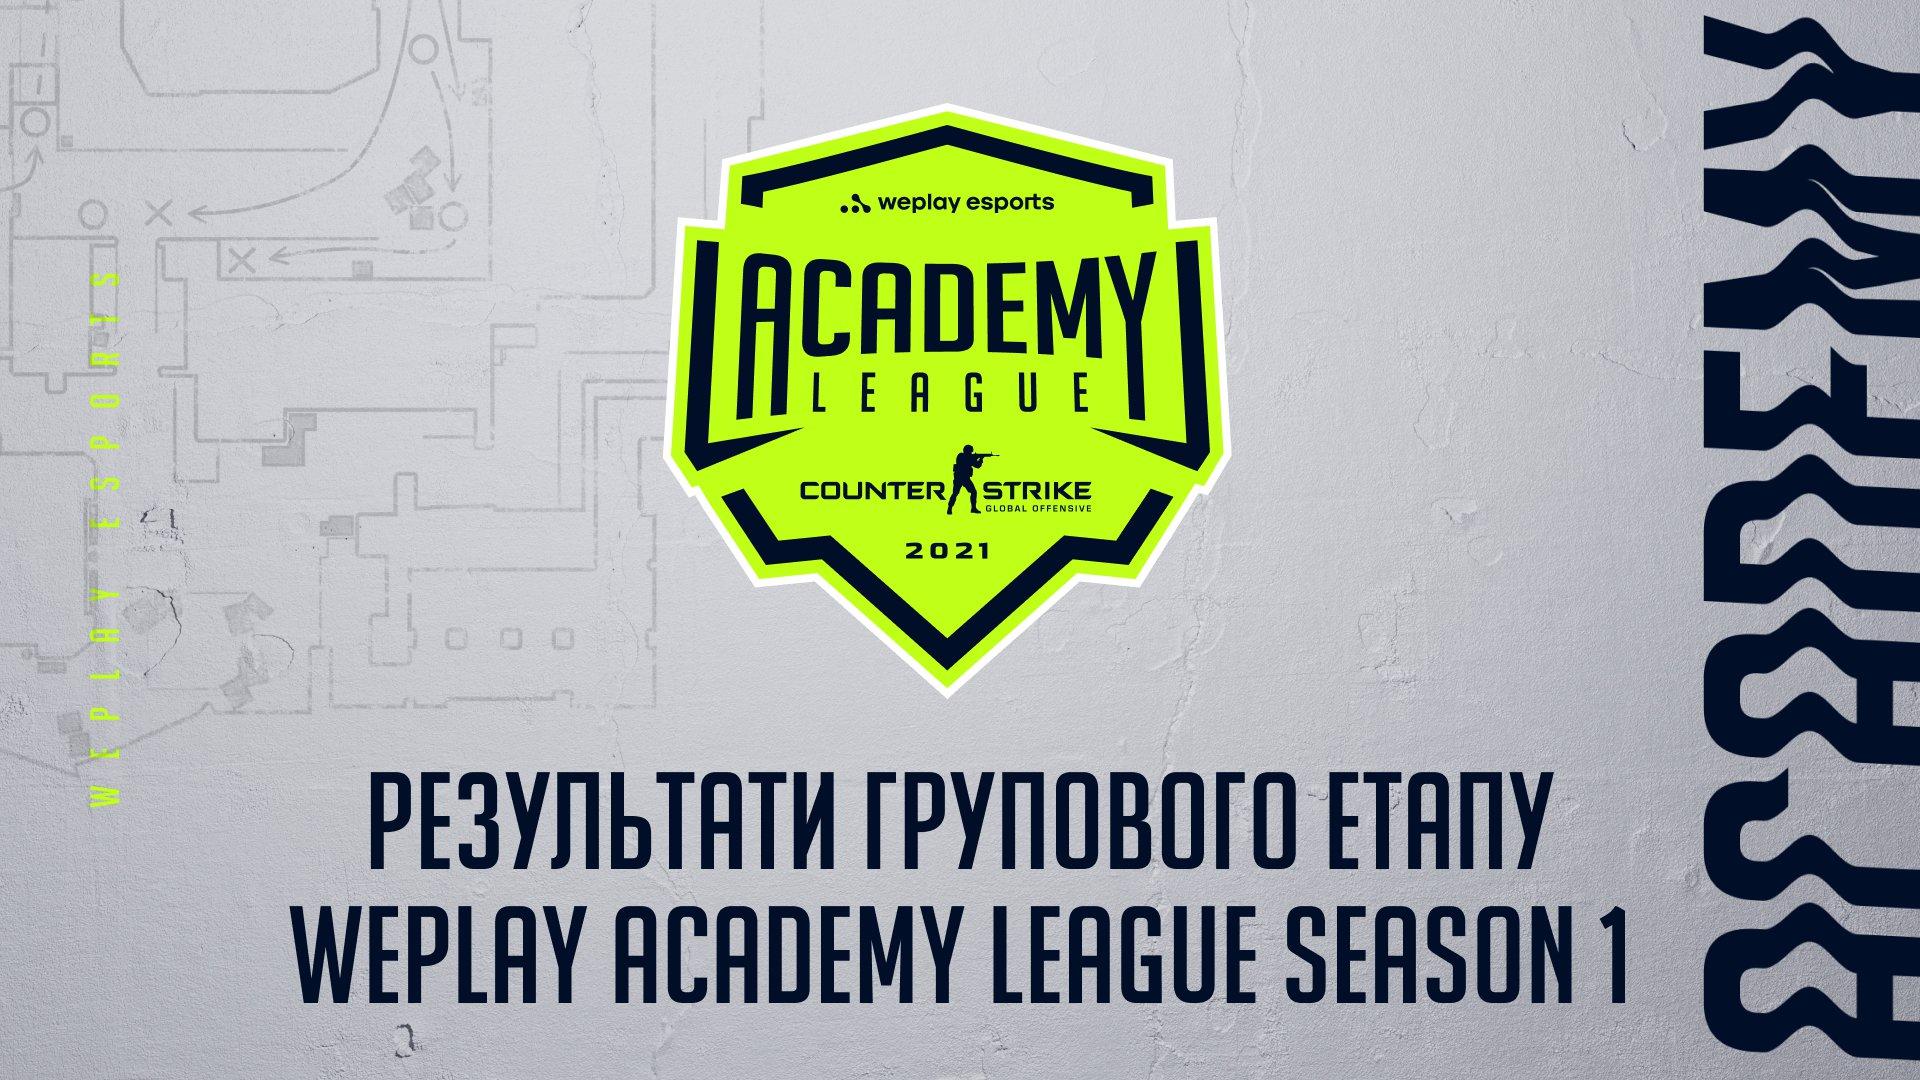 Результати групового етапу WePlay Academy League Season 1. Зображення: WePlay Holding